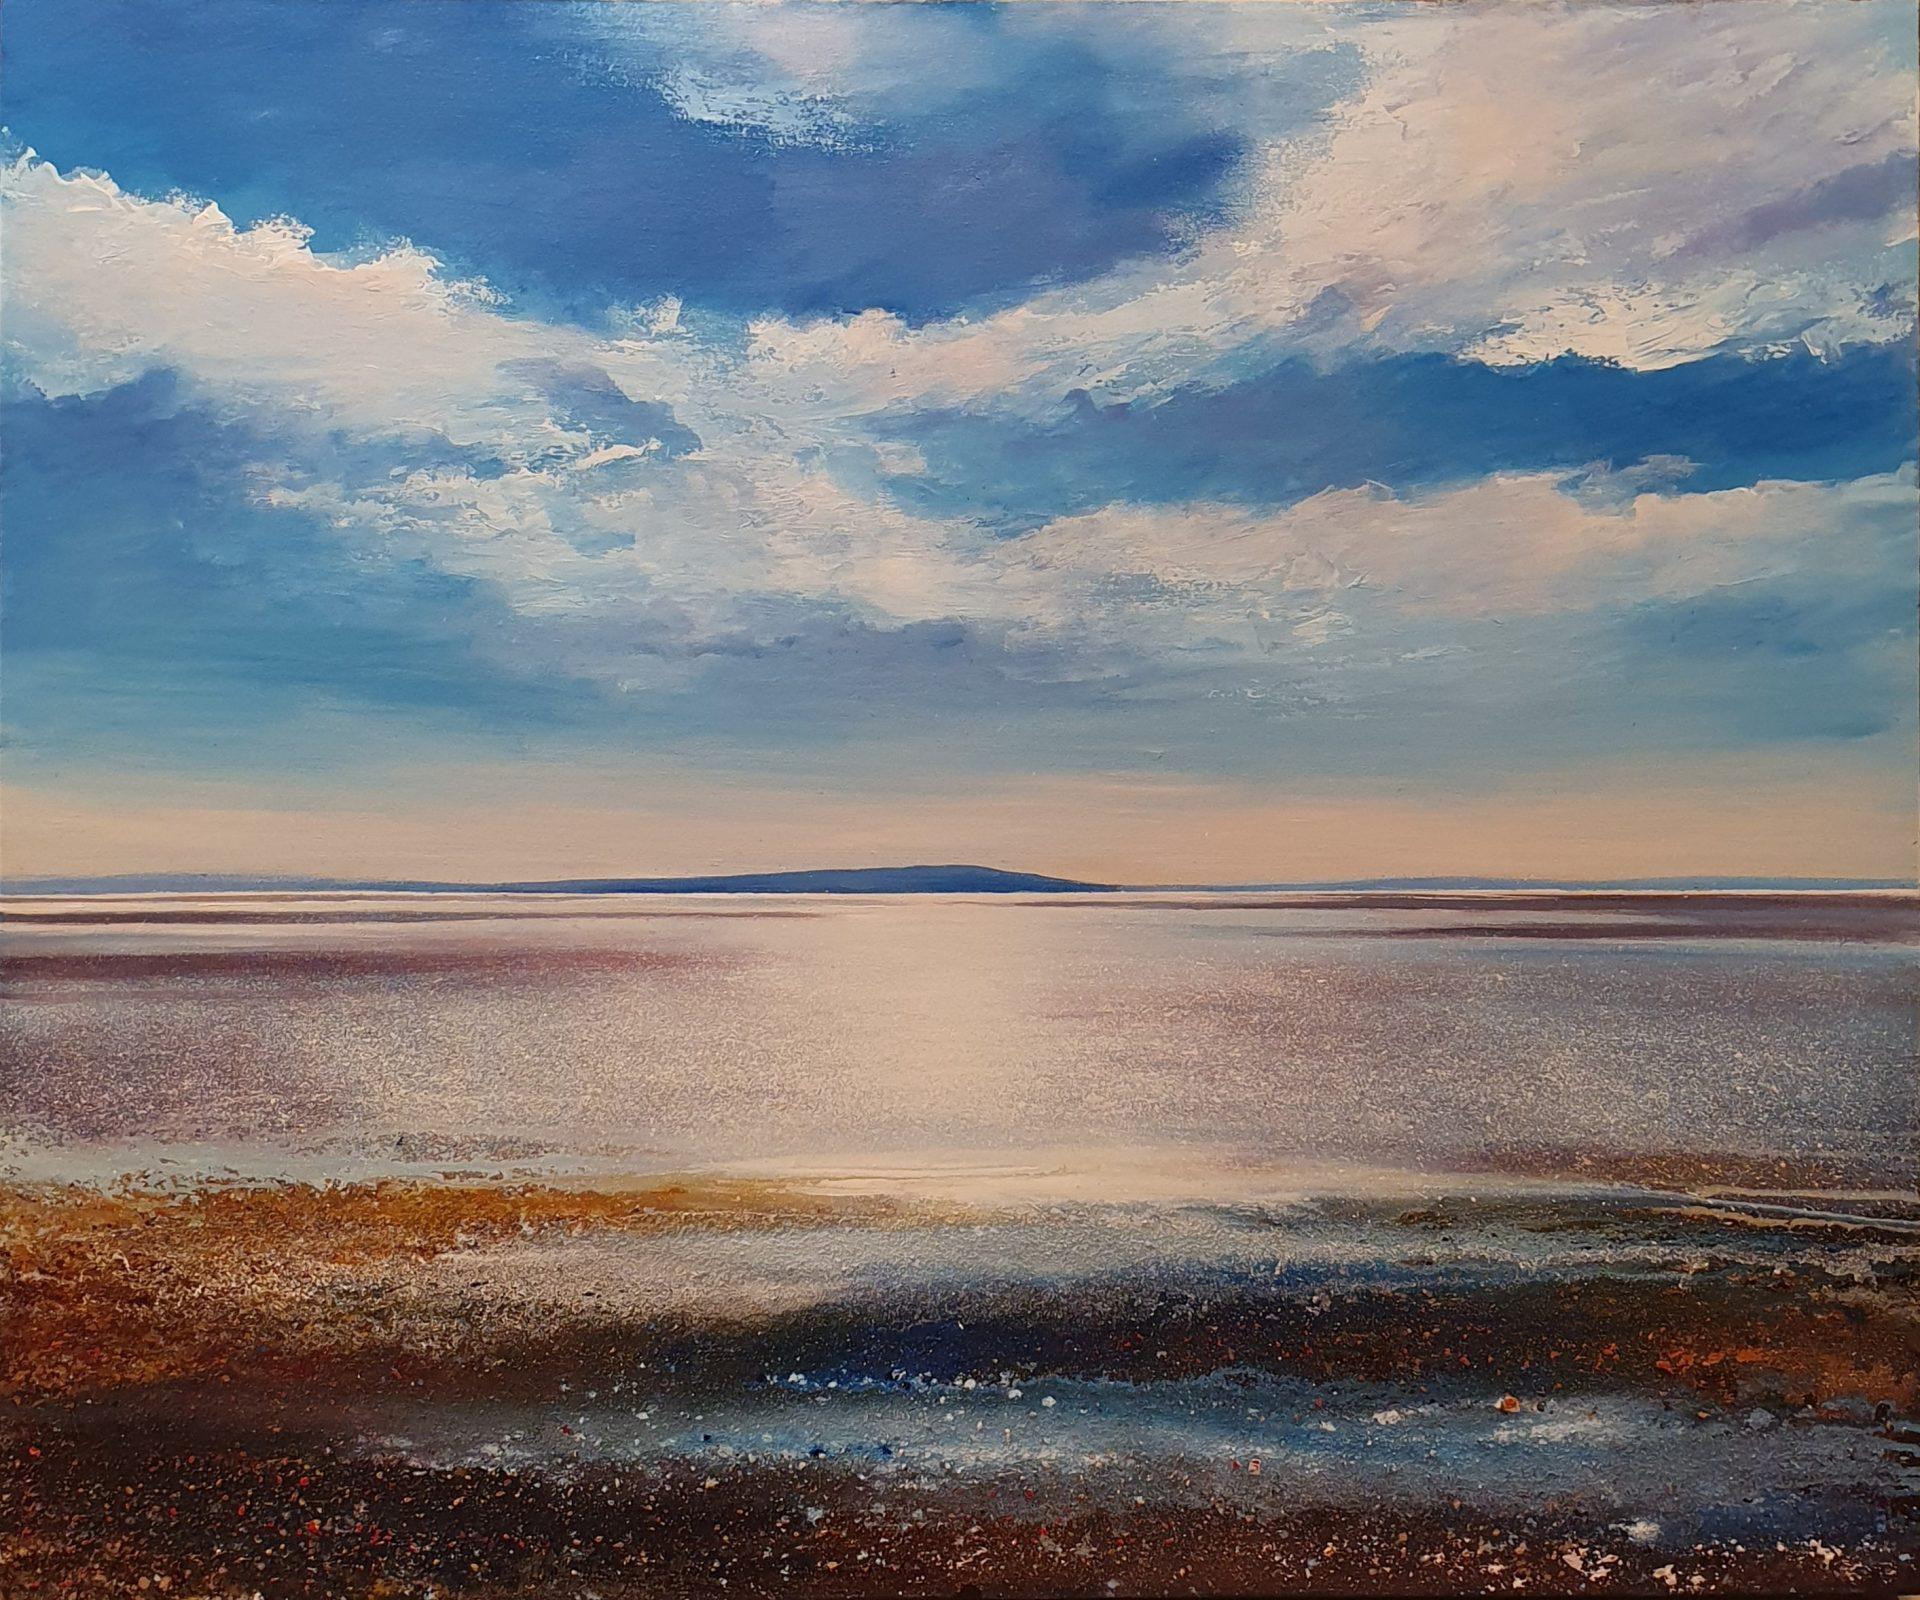 John Connolly Solway Sparkle coastal beach painting for sale